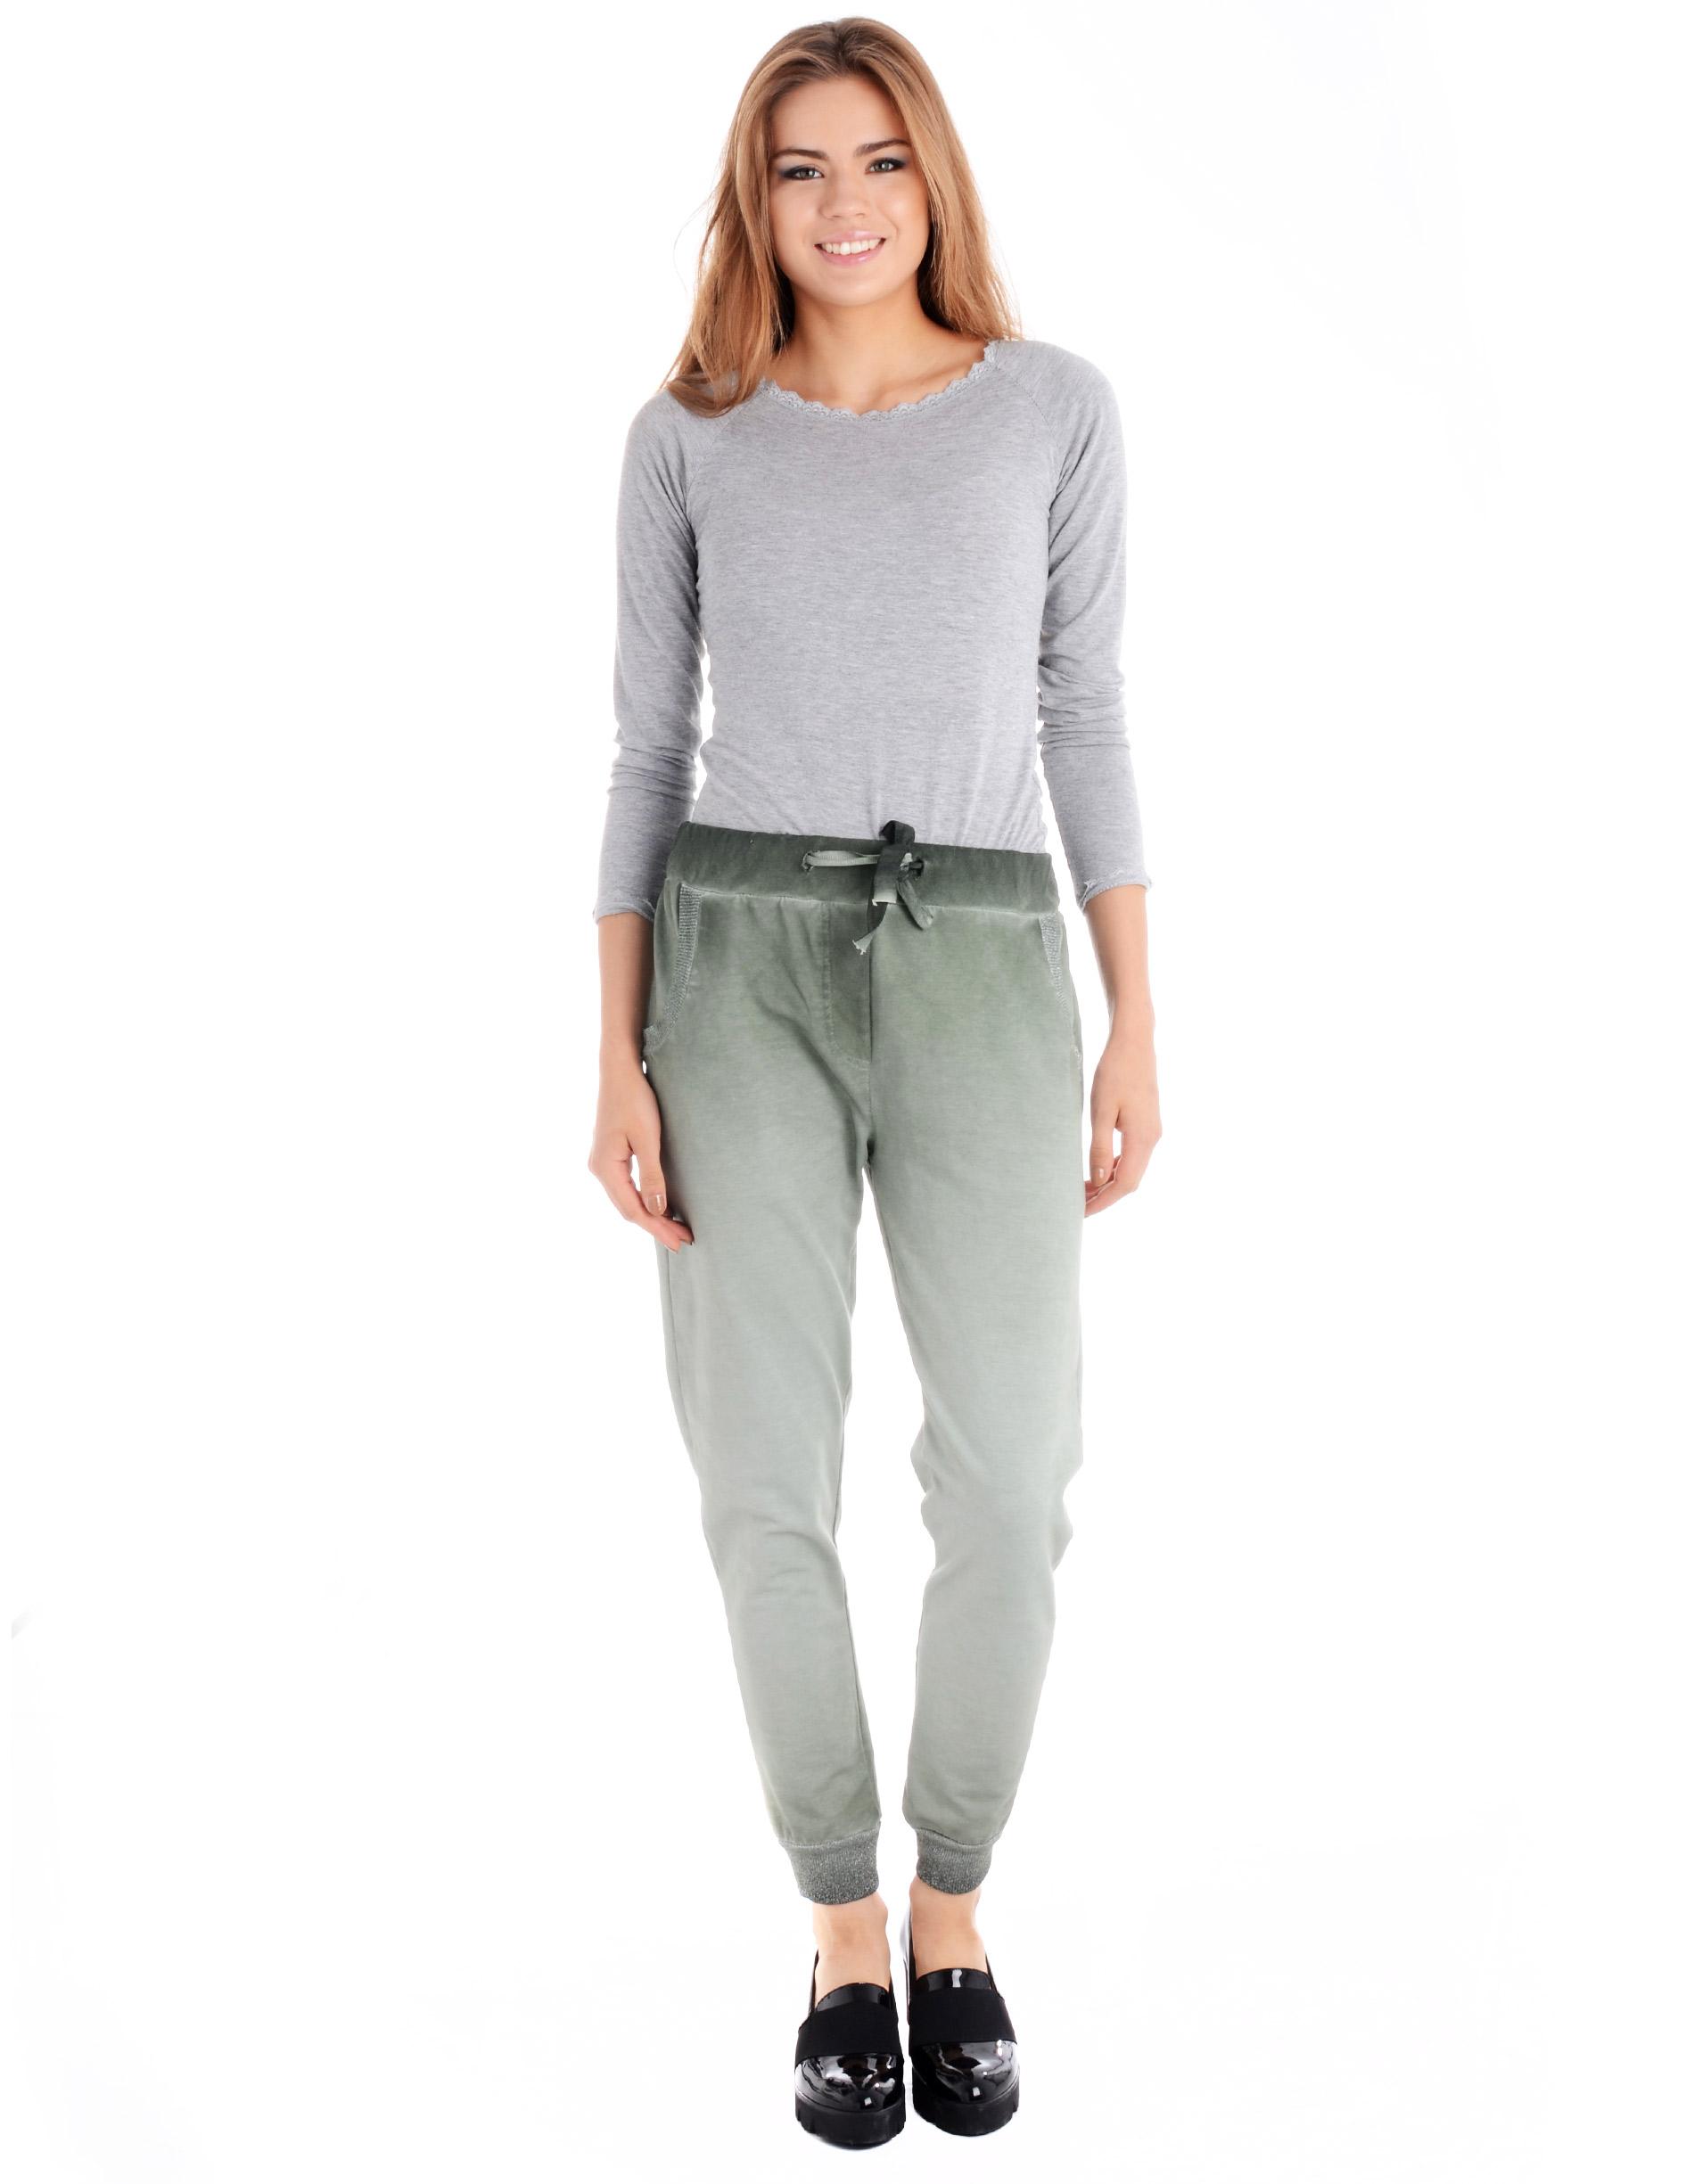 Spodnie - 137-3023 MILI - Unisono